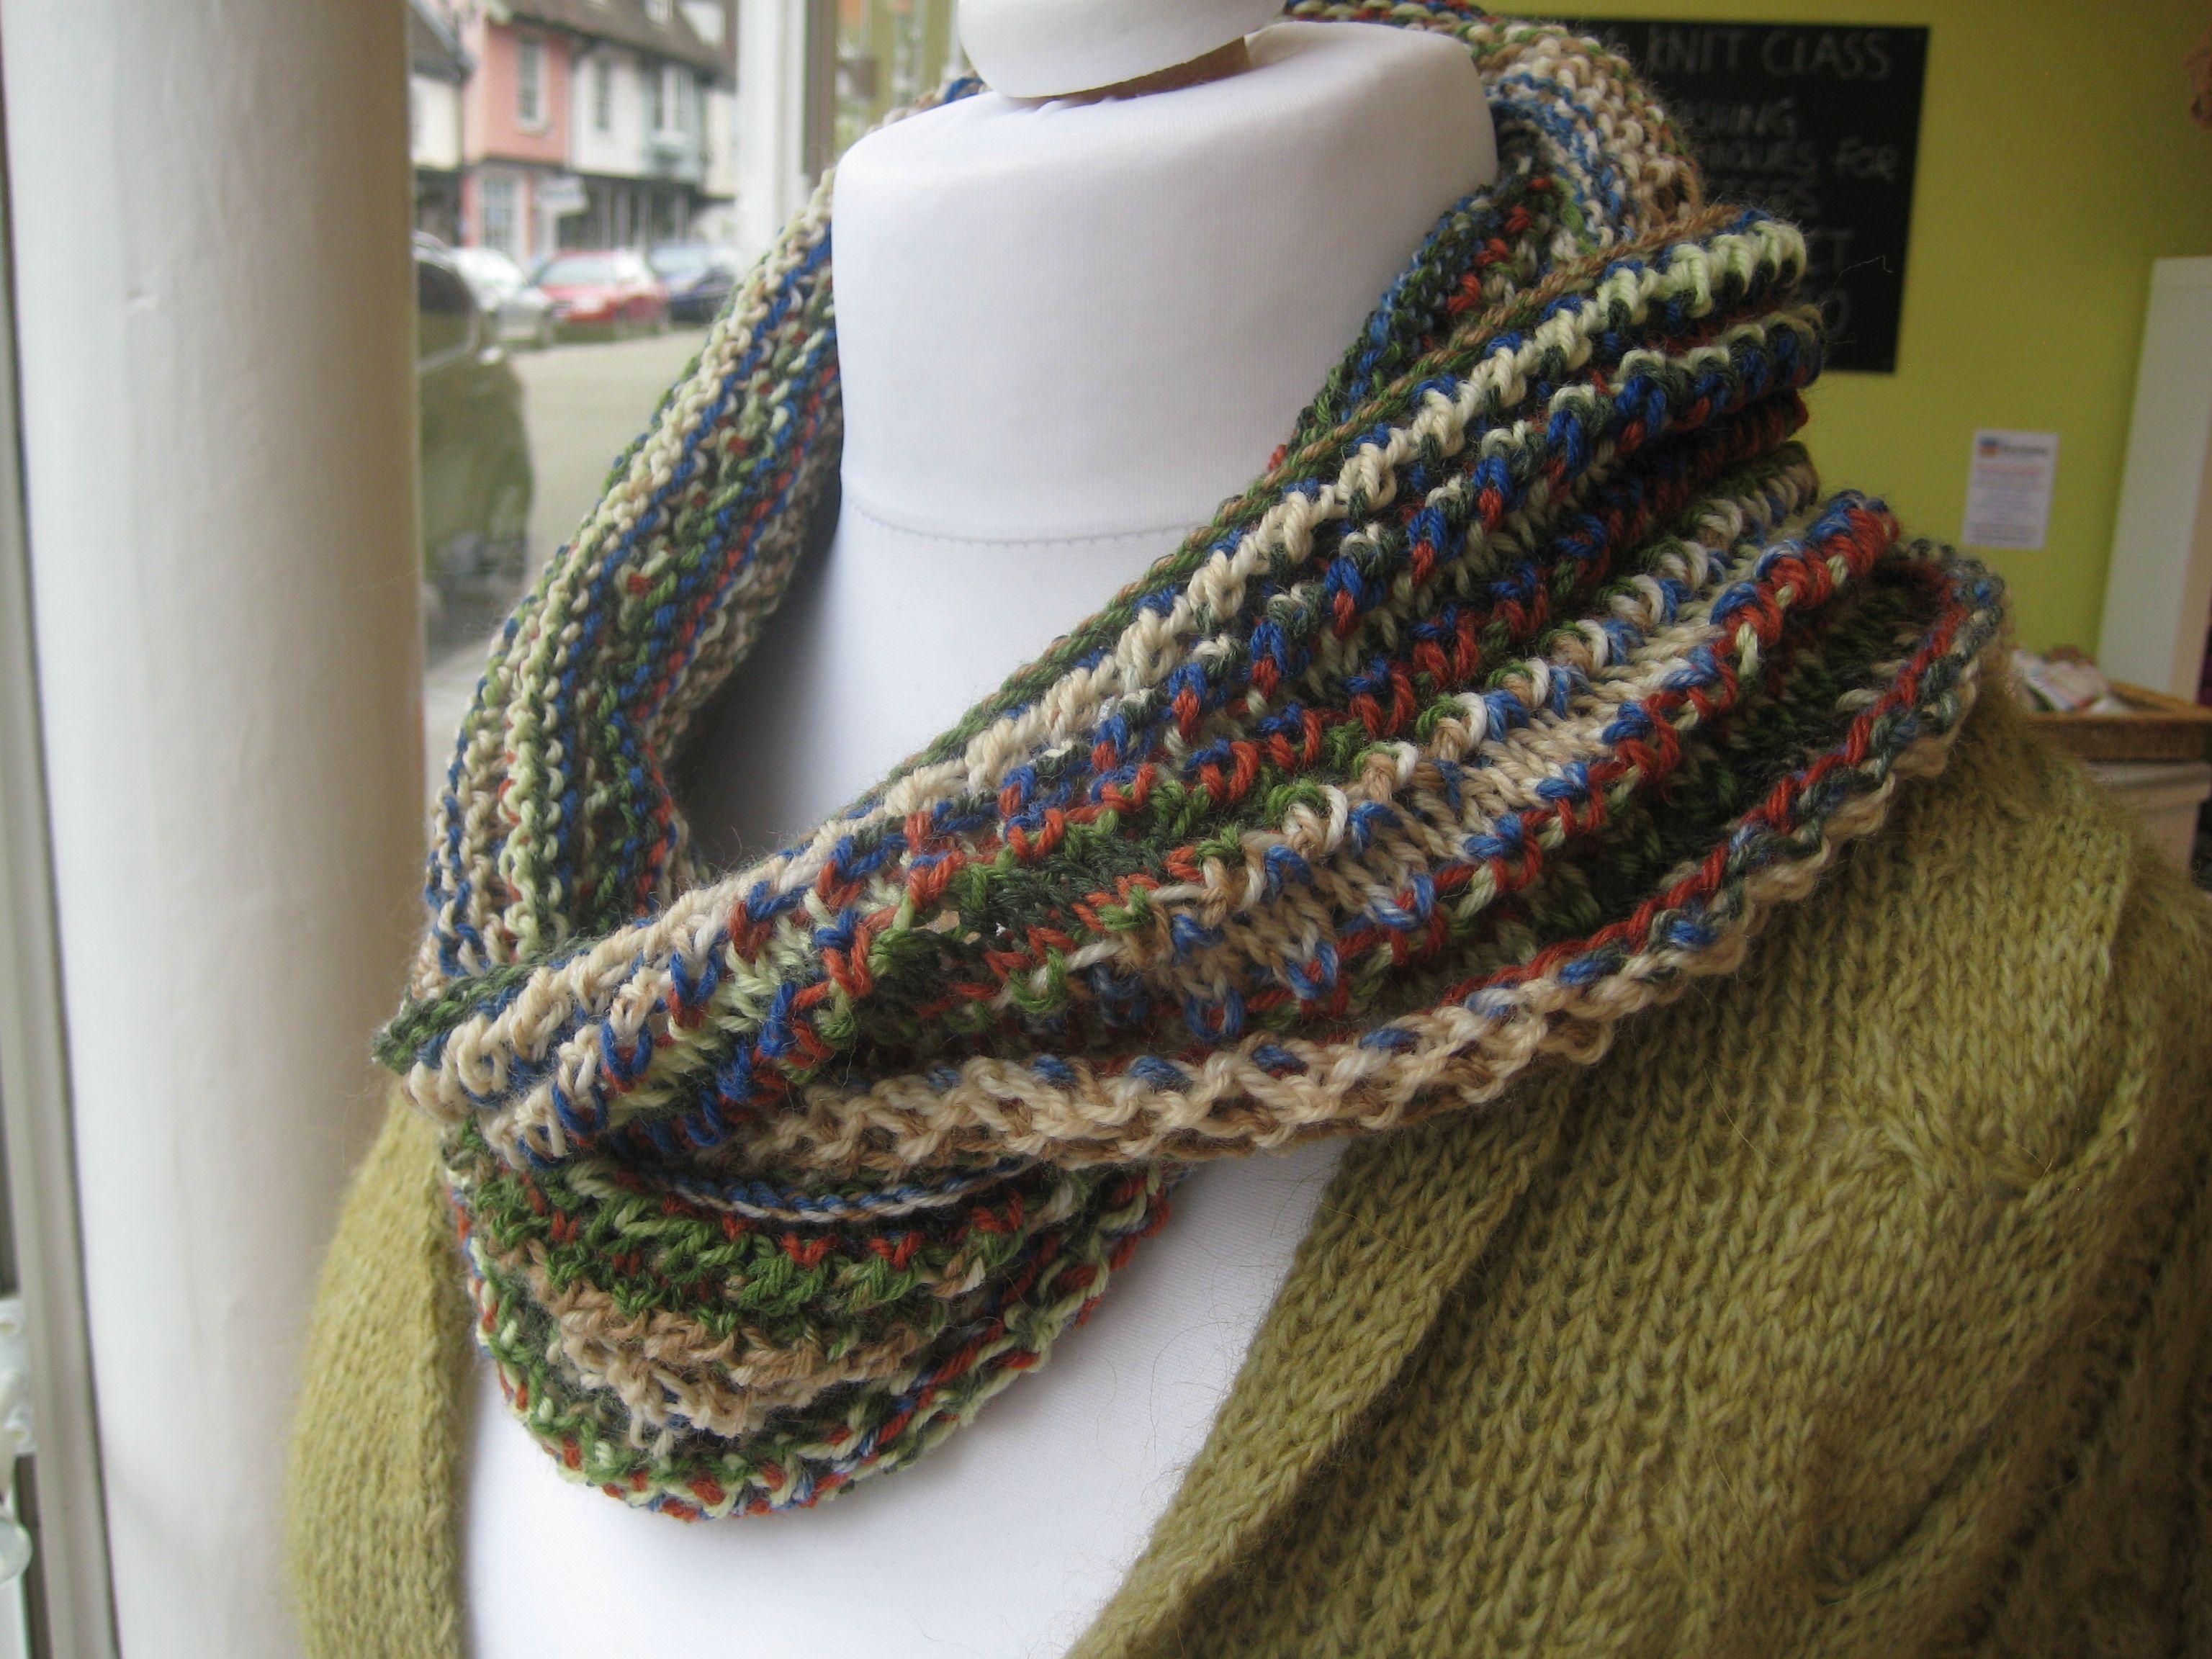 Knitcol Cowl | Knitting - IN MY QUEUE | Pinterest | Circular needles ...